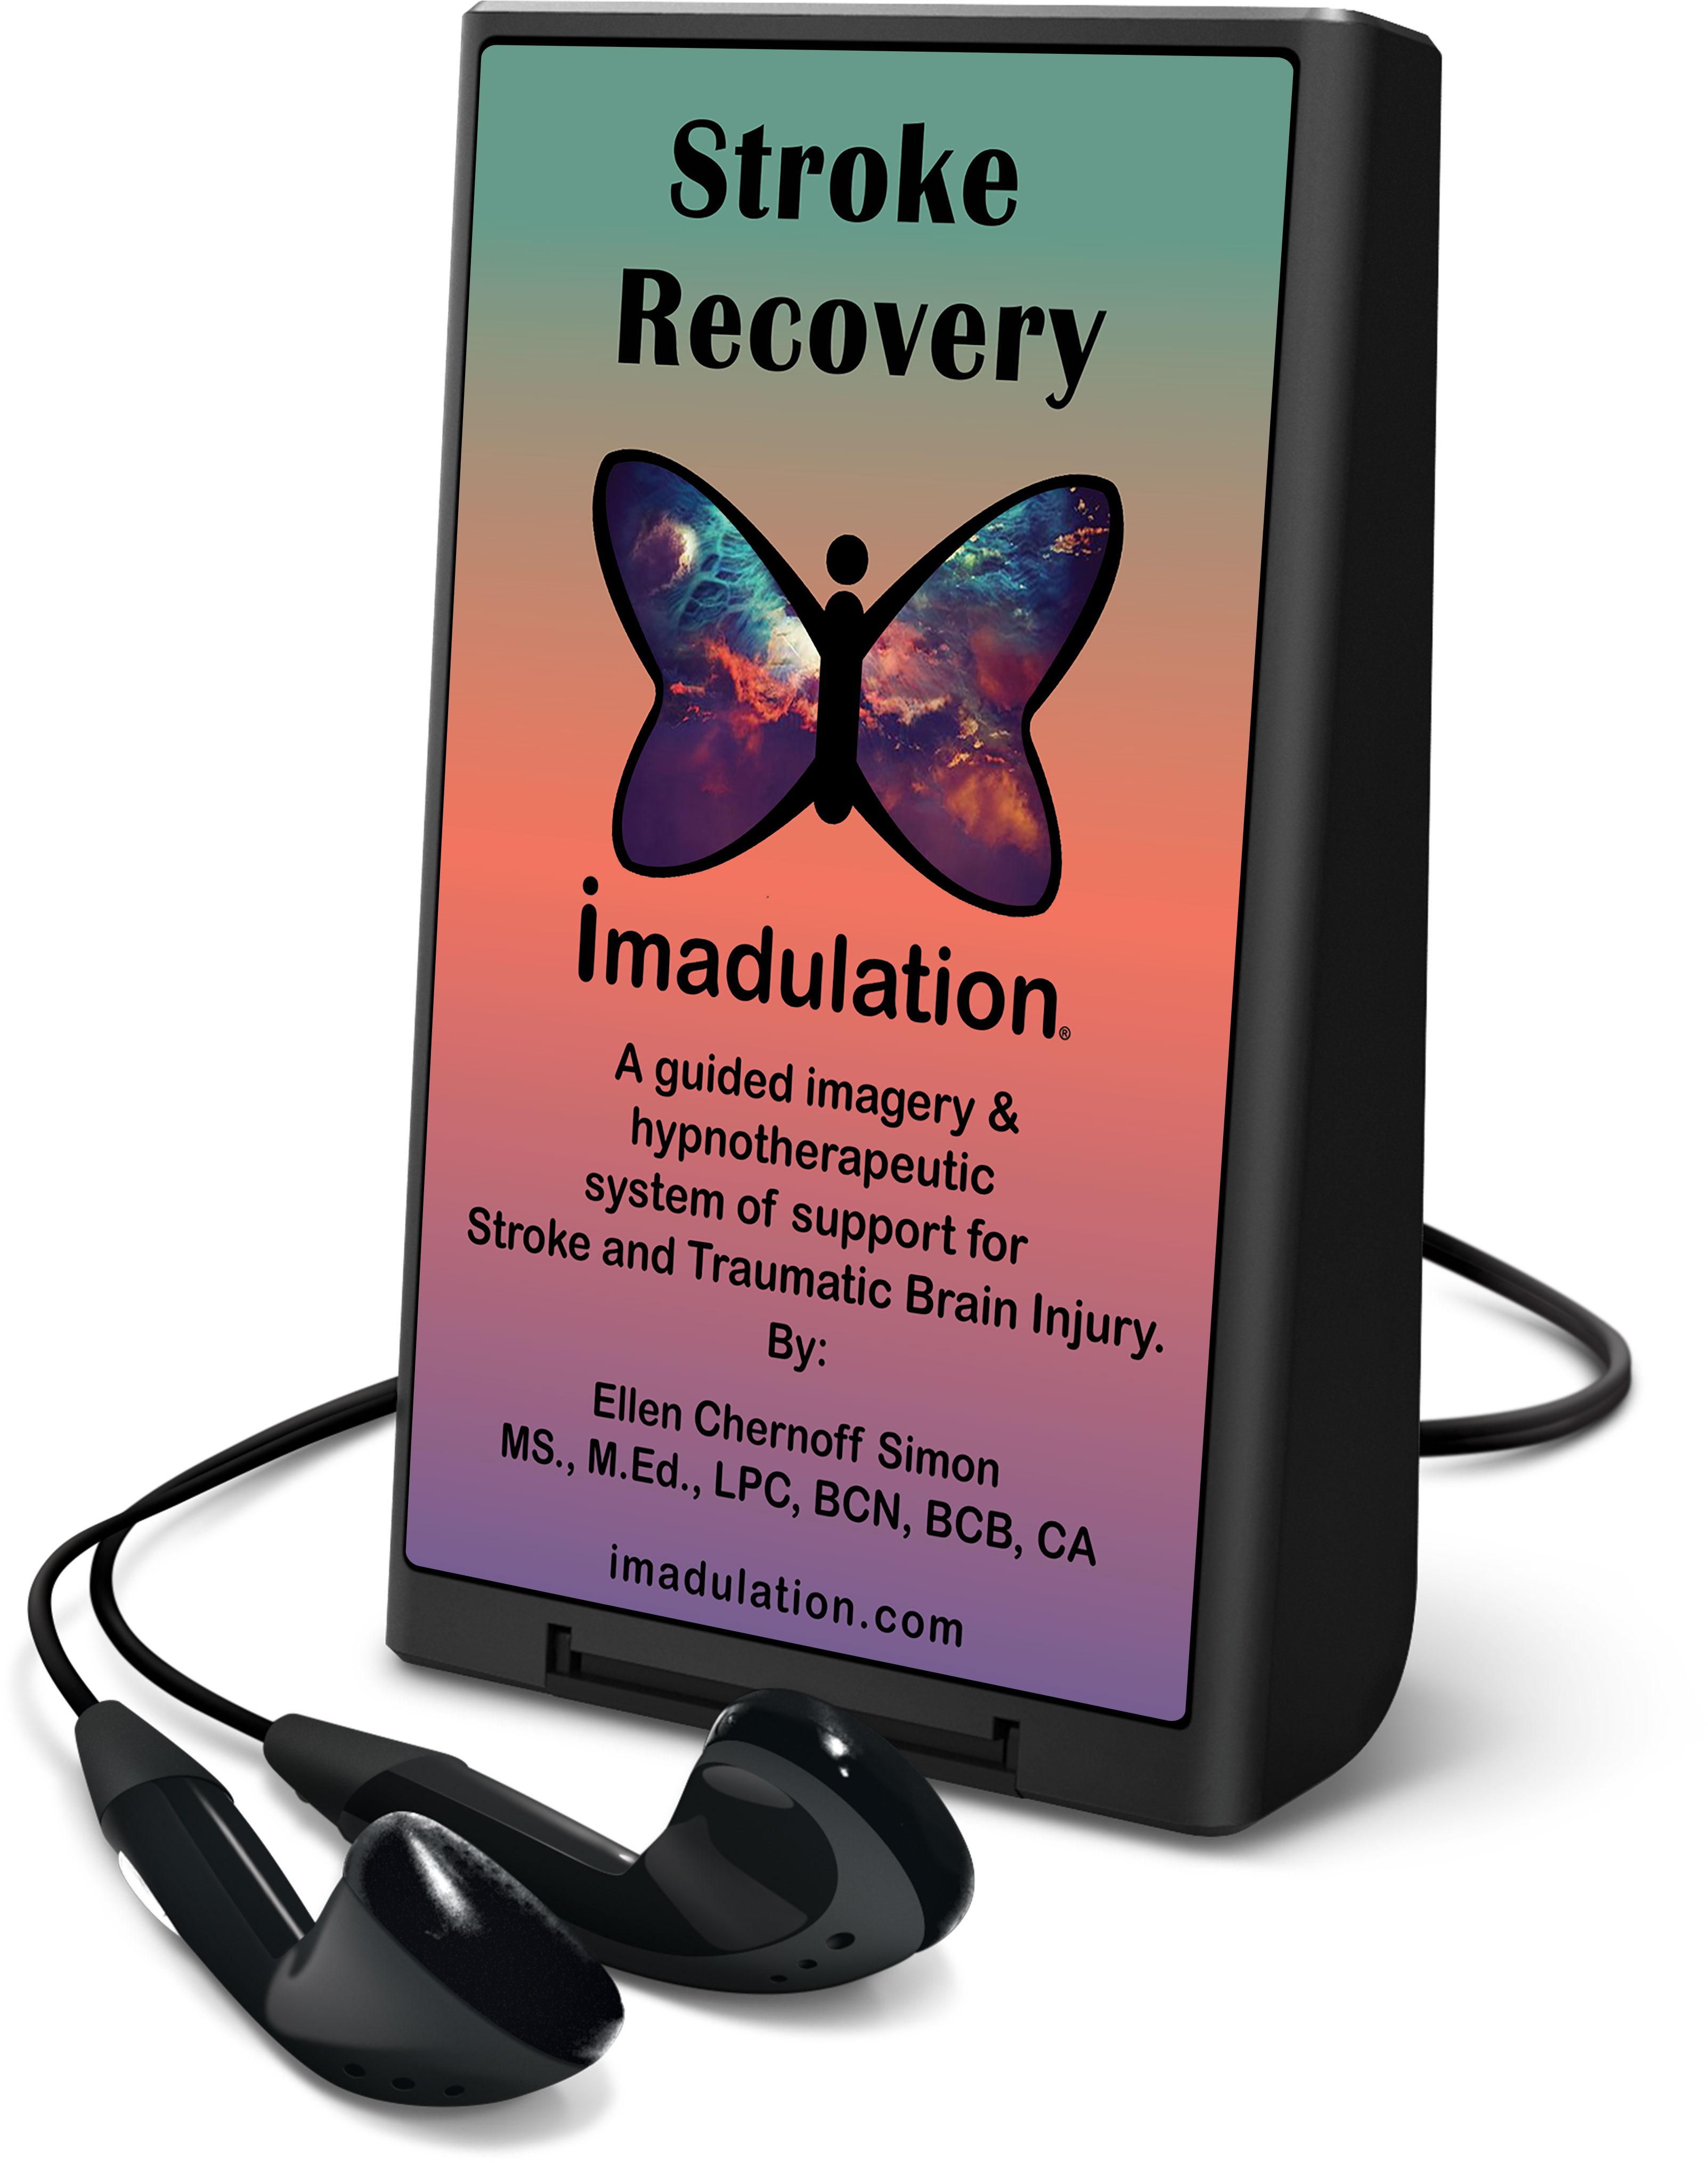 20301-strokerecovery-heroshot.jpg